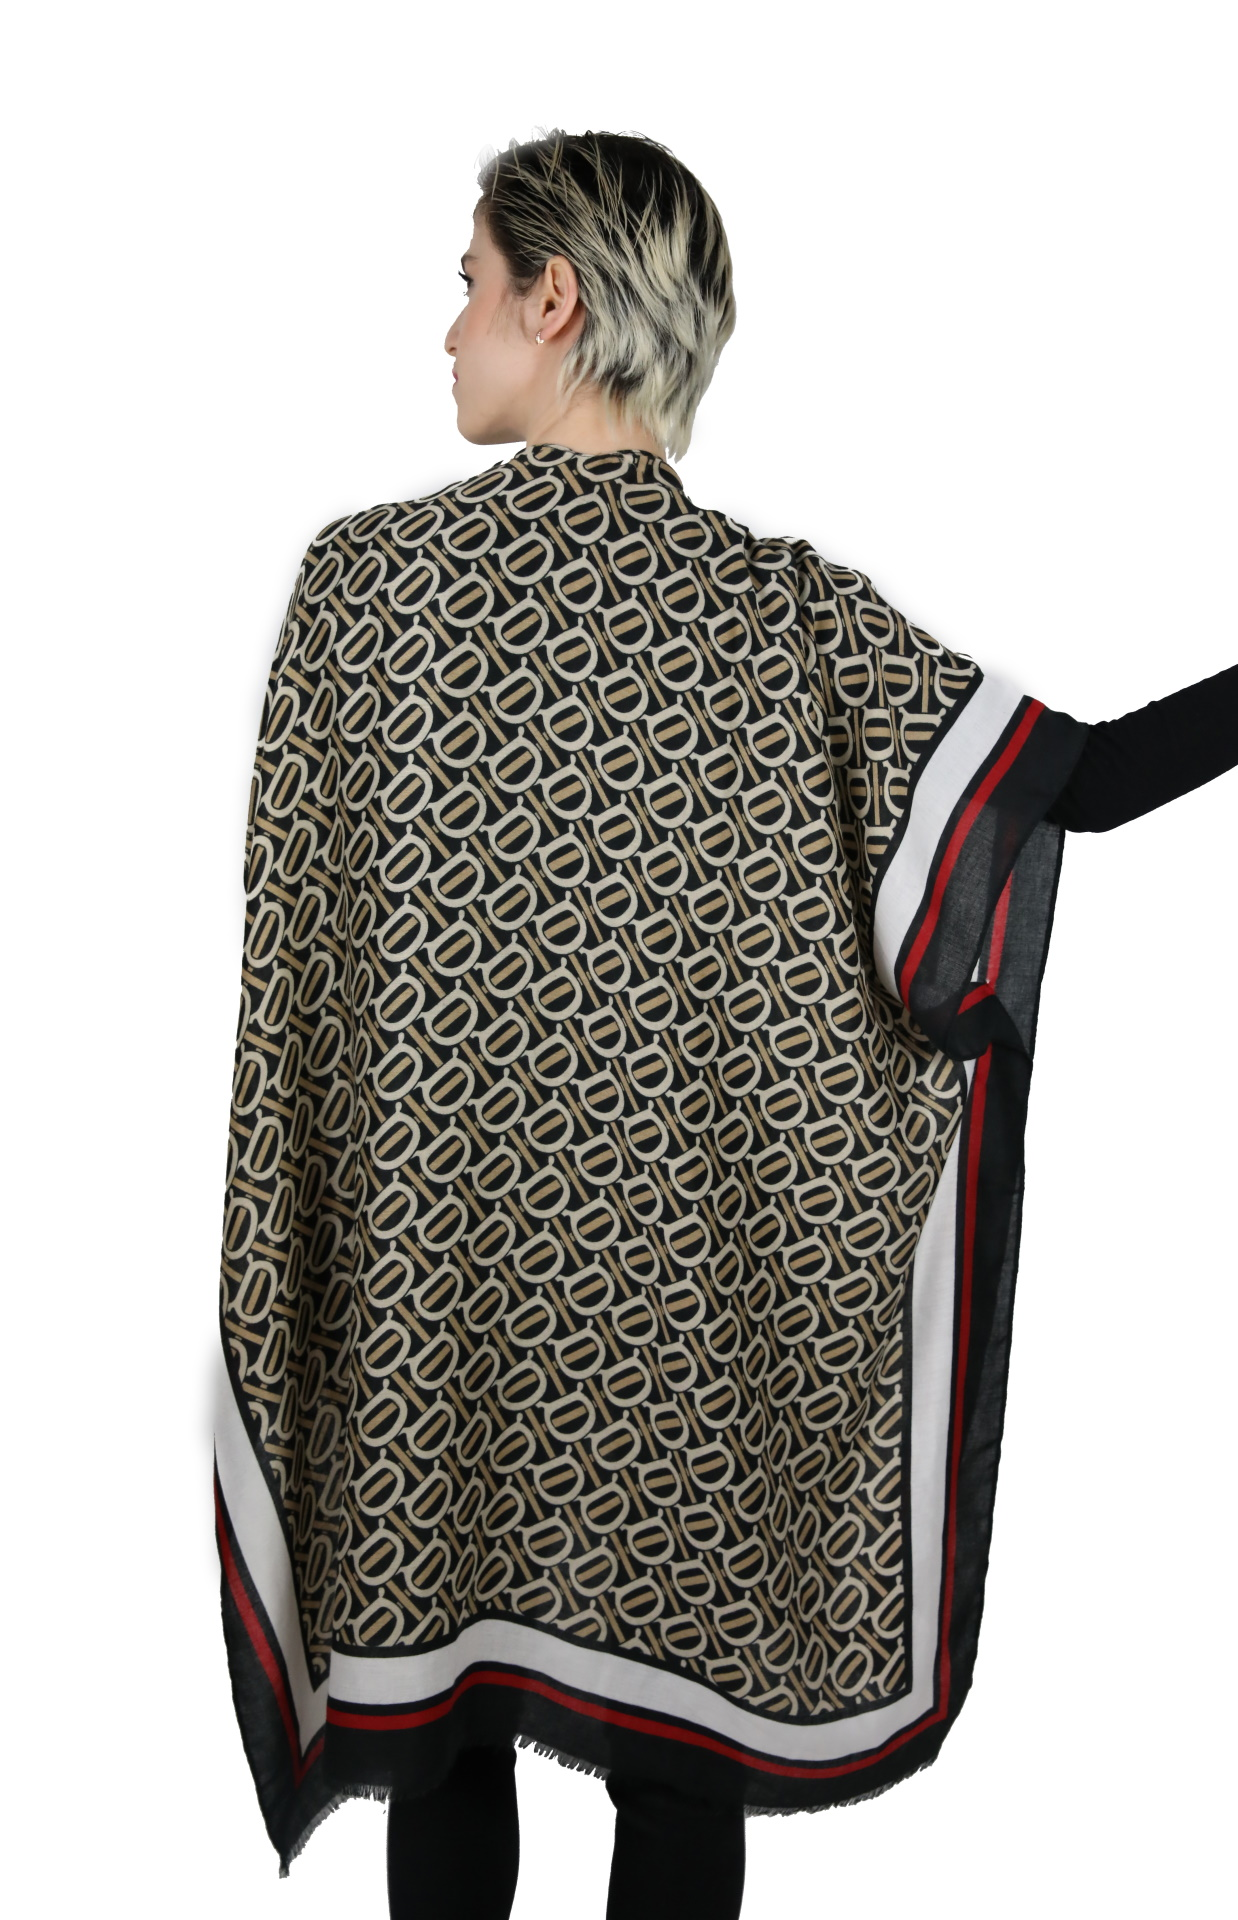 CLOTHES16 STOLA DONNA FOULARD CARDIGAN COPRISPALLE 1 1stAmerican elegante stola da donna foulard cardigan coprispalle